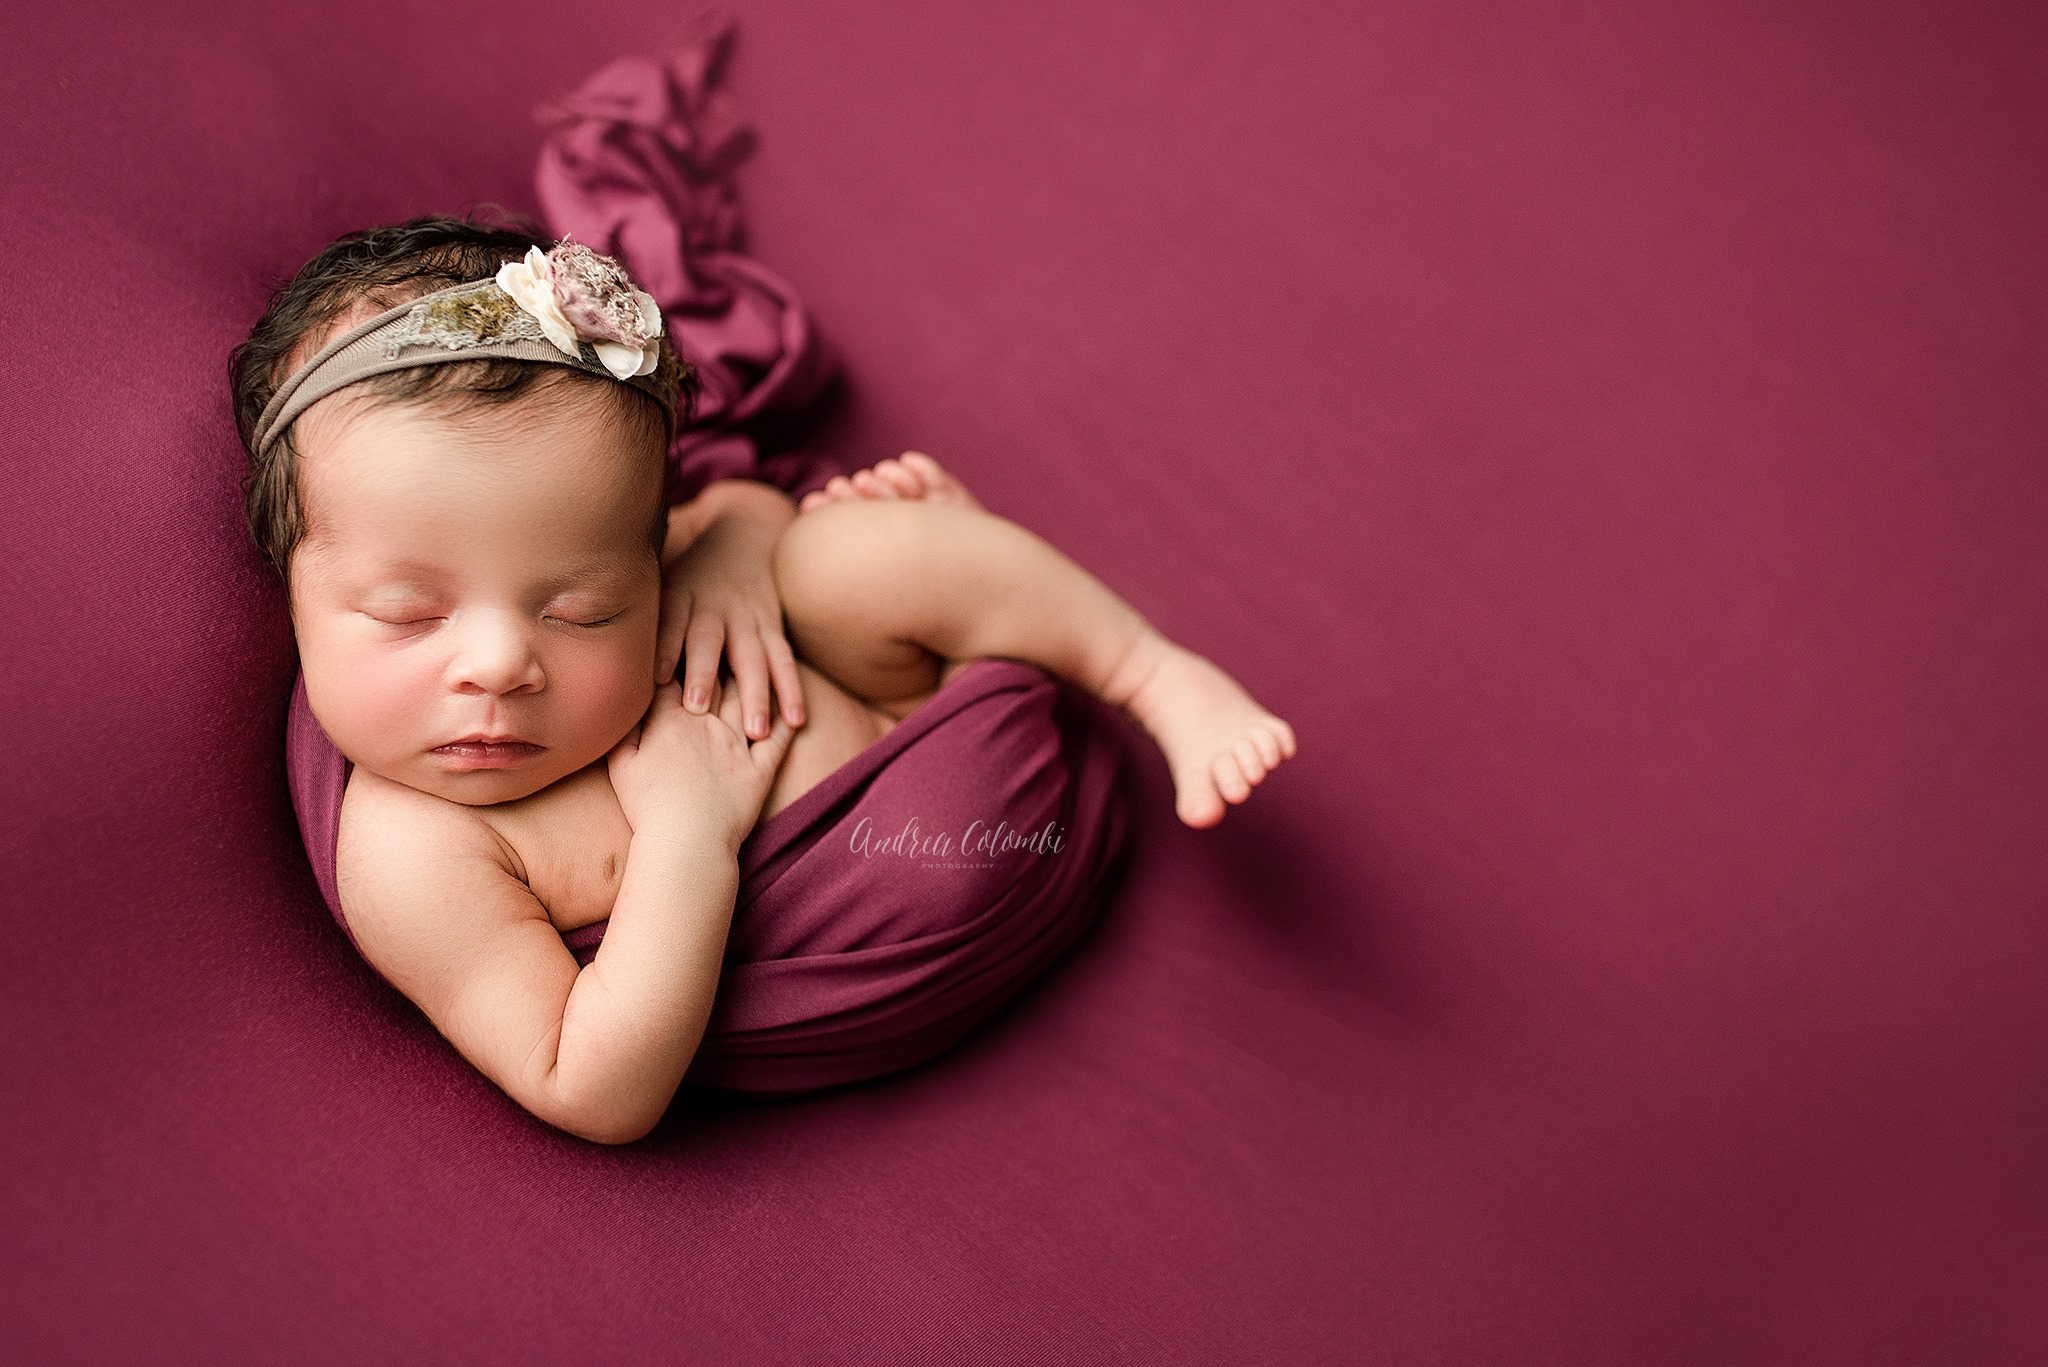 Andrea colombi photography south florida newborn photographer